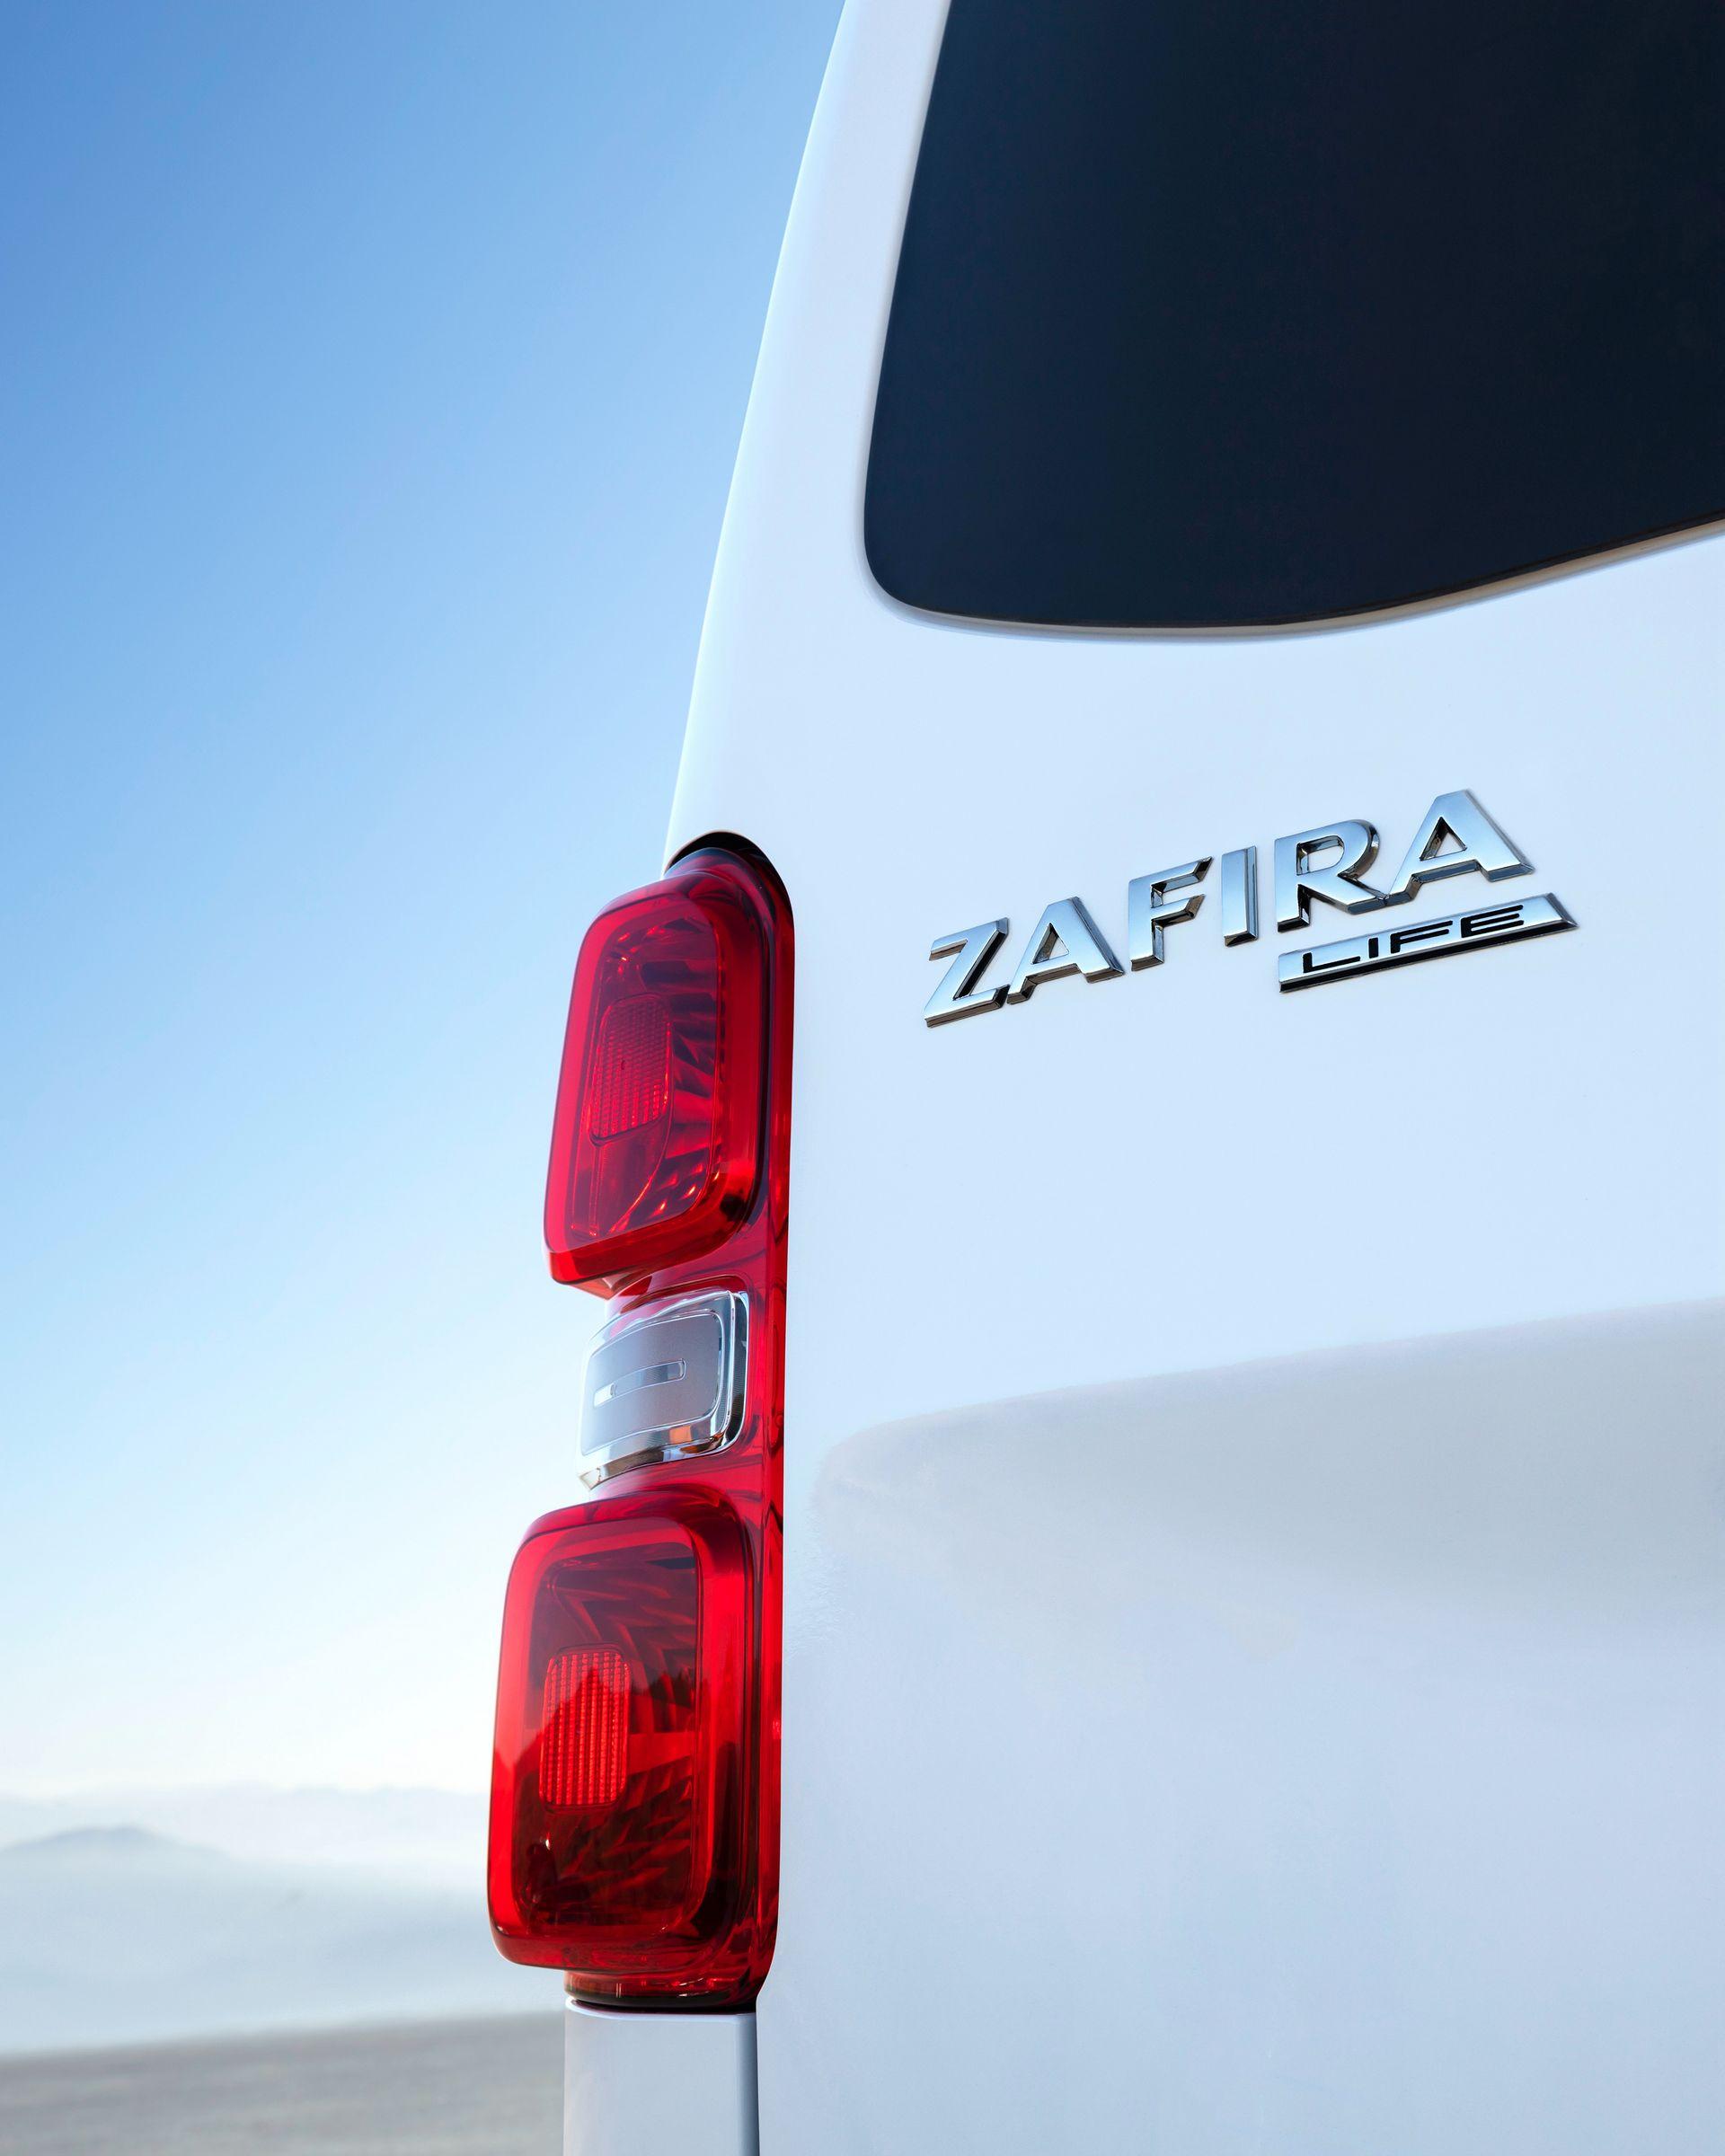 Car Transport Reviews >> 2019 Opel Zafira Life (Vauxhall Vivaro Life) Revealed, EV ...